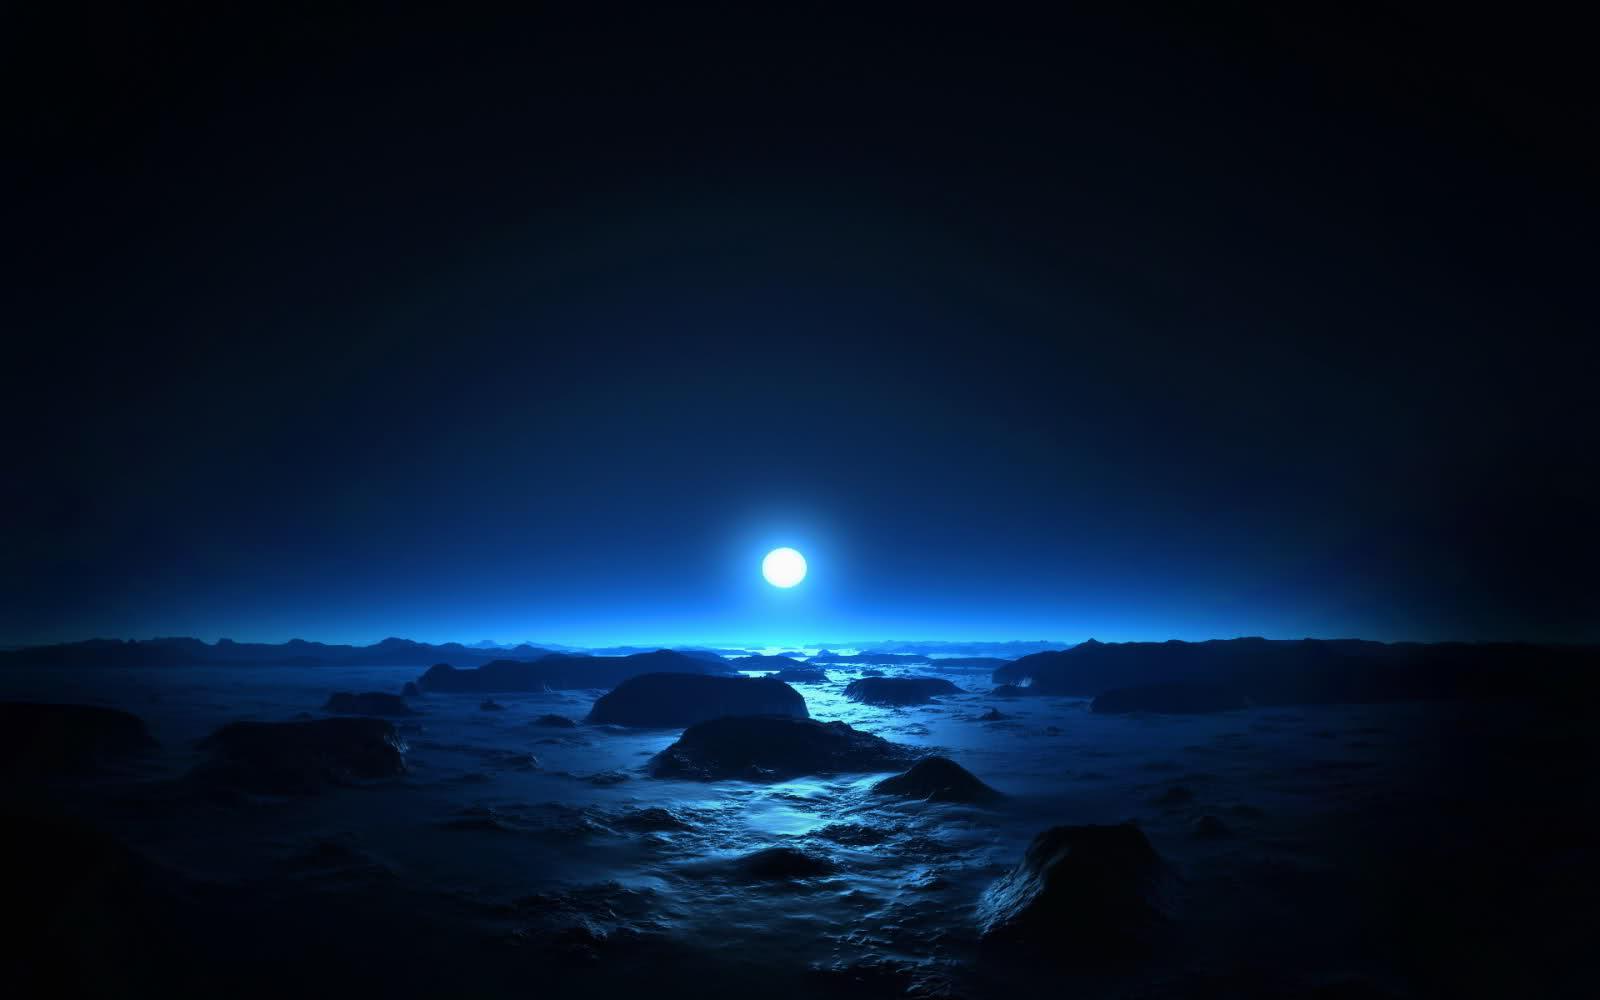 Dark Moon In Sky - High-quality